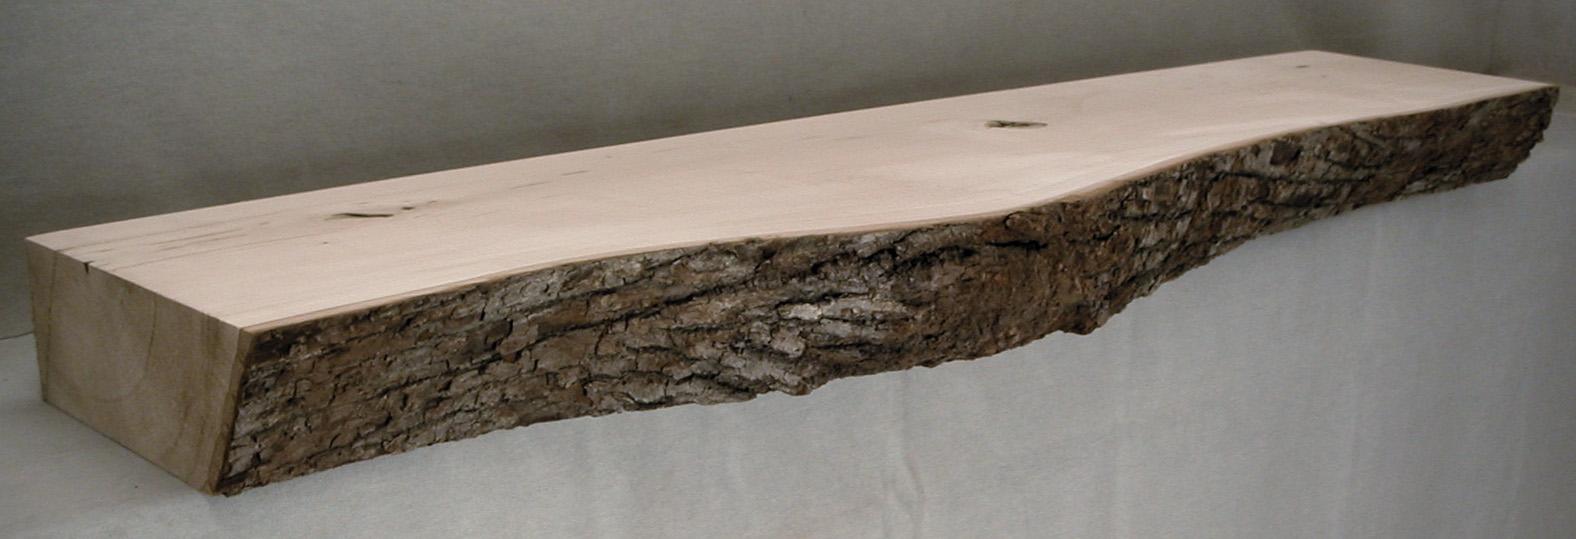 Log Style Fireplace Mantels - Hardwood - Hartford, WI